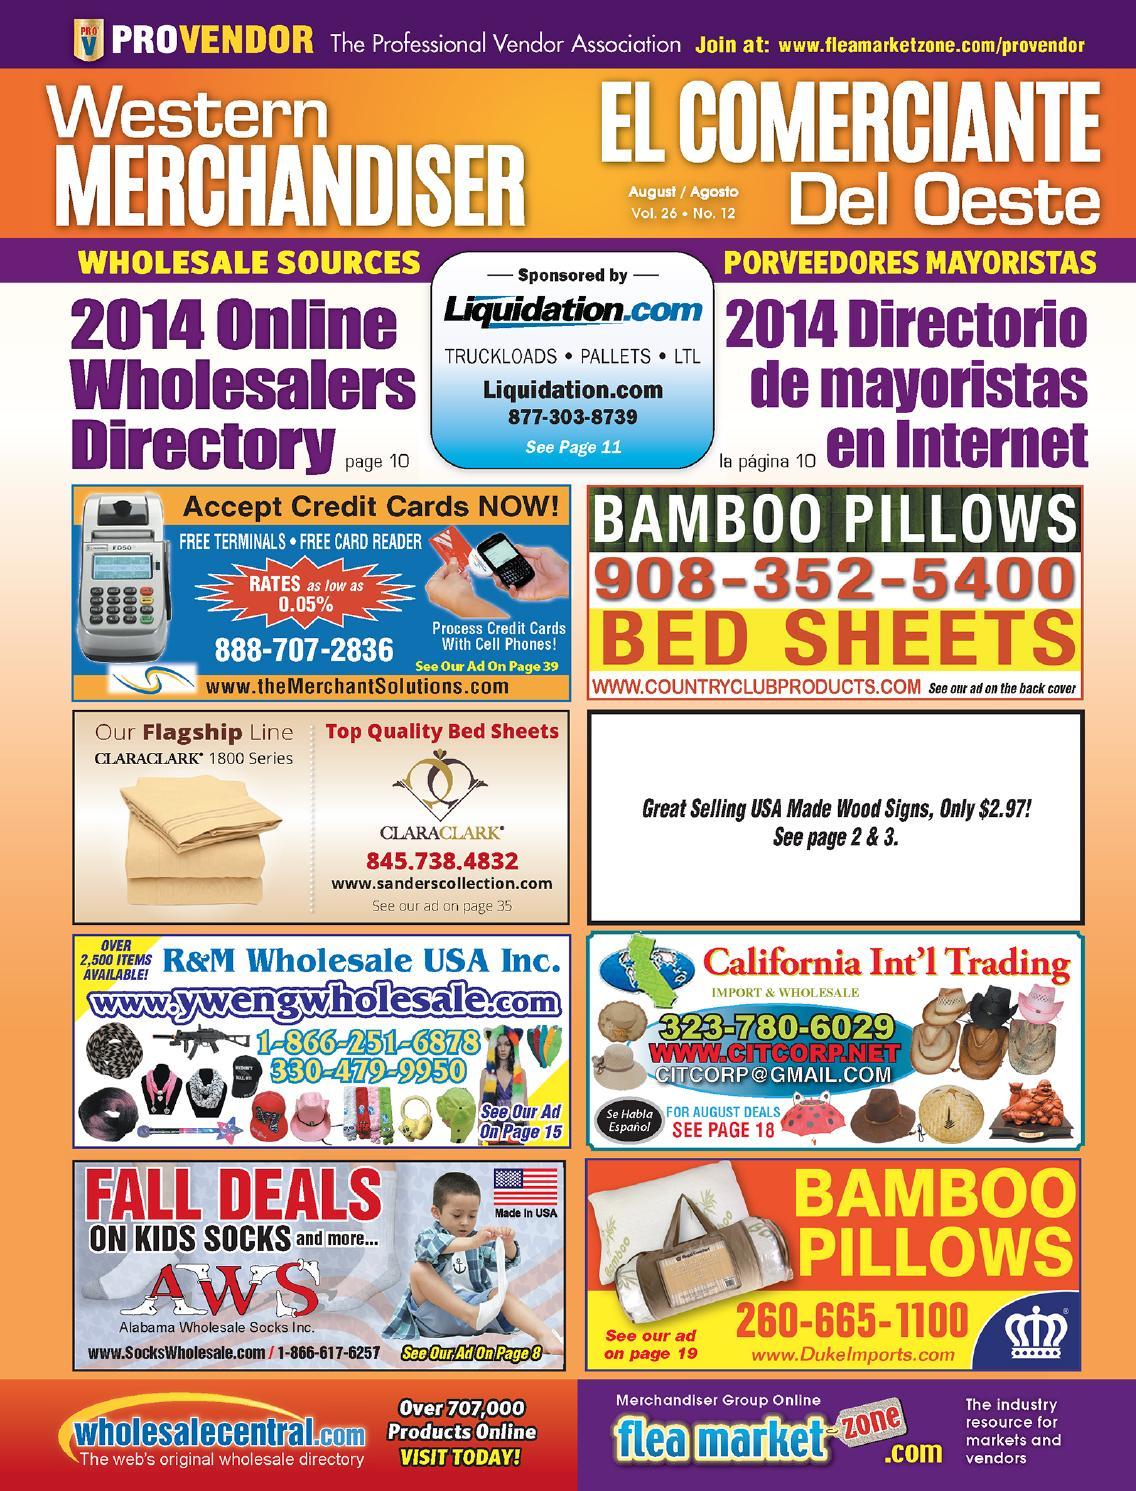 c74164f476 Western Merchandiser 08-14 by Sumner Communications - issuu